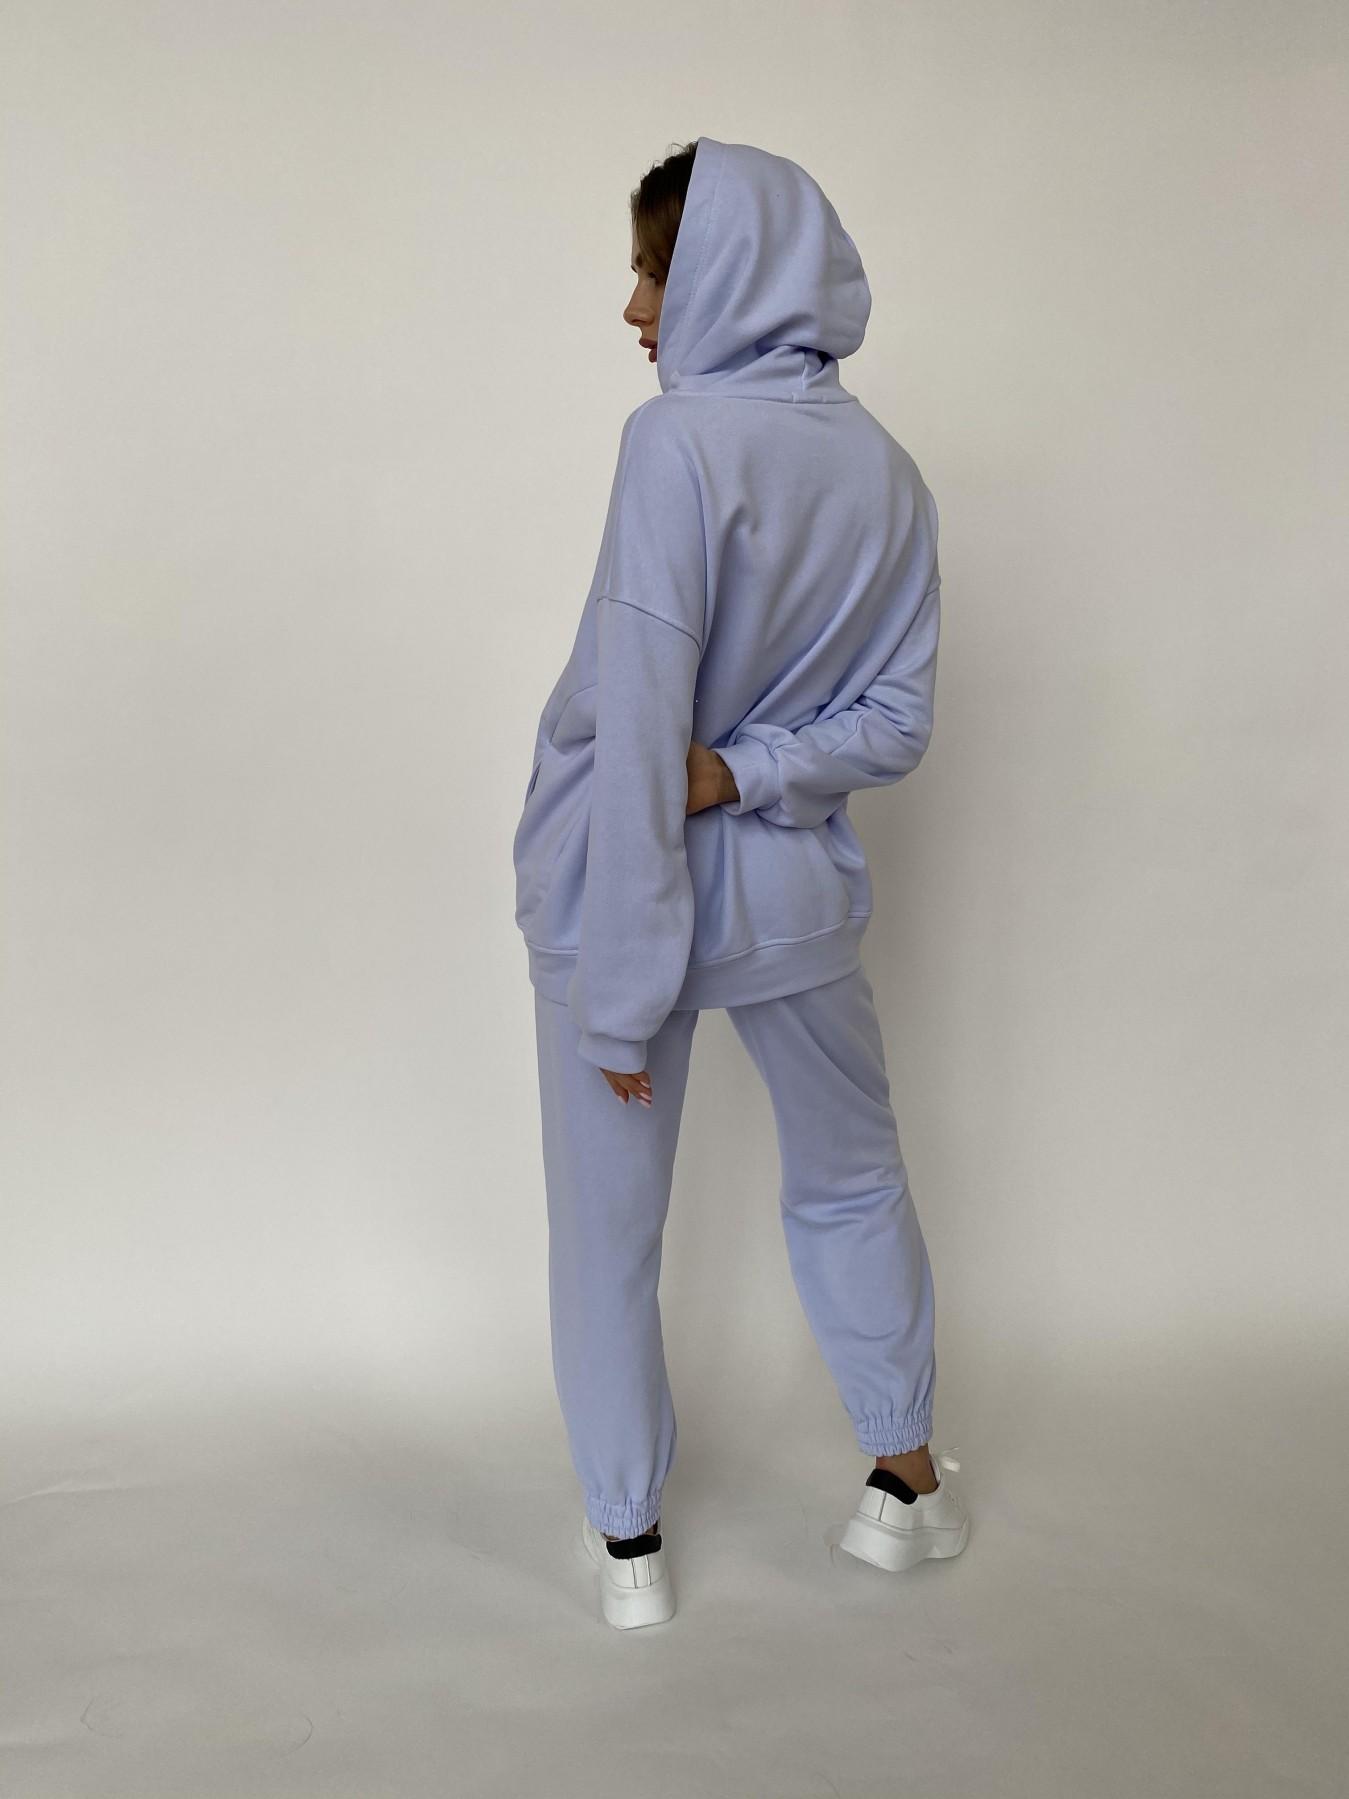 Марион костюм из 3х нитки 10581 АРТ. 47635 Цвет: Голубой Светлый - фото 9, интернет магазин tm-modus.ru